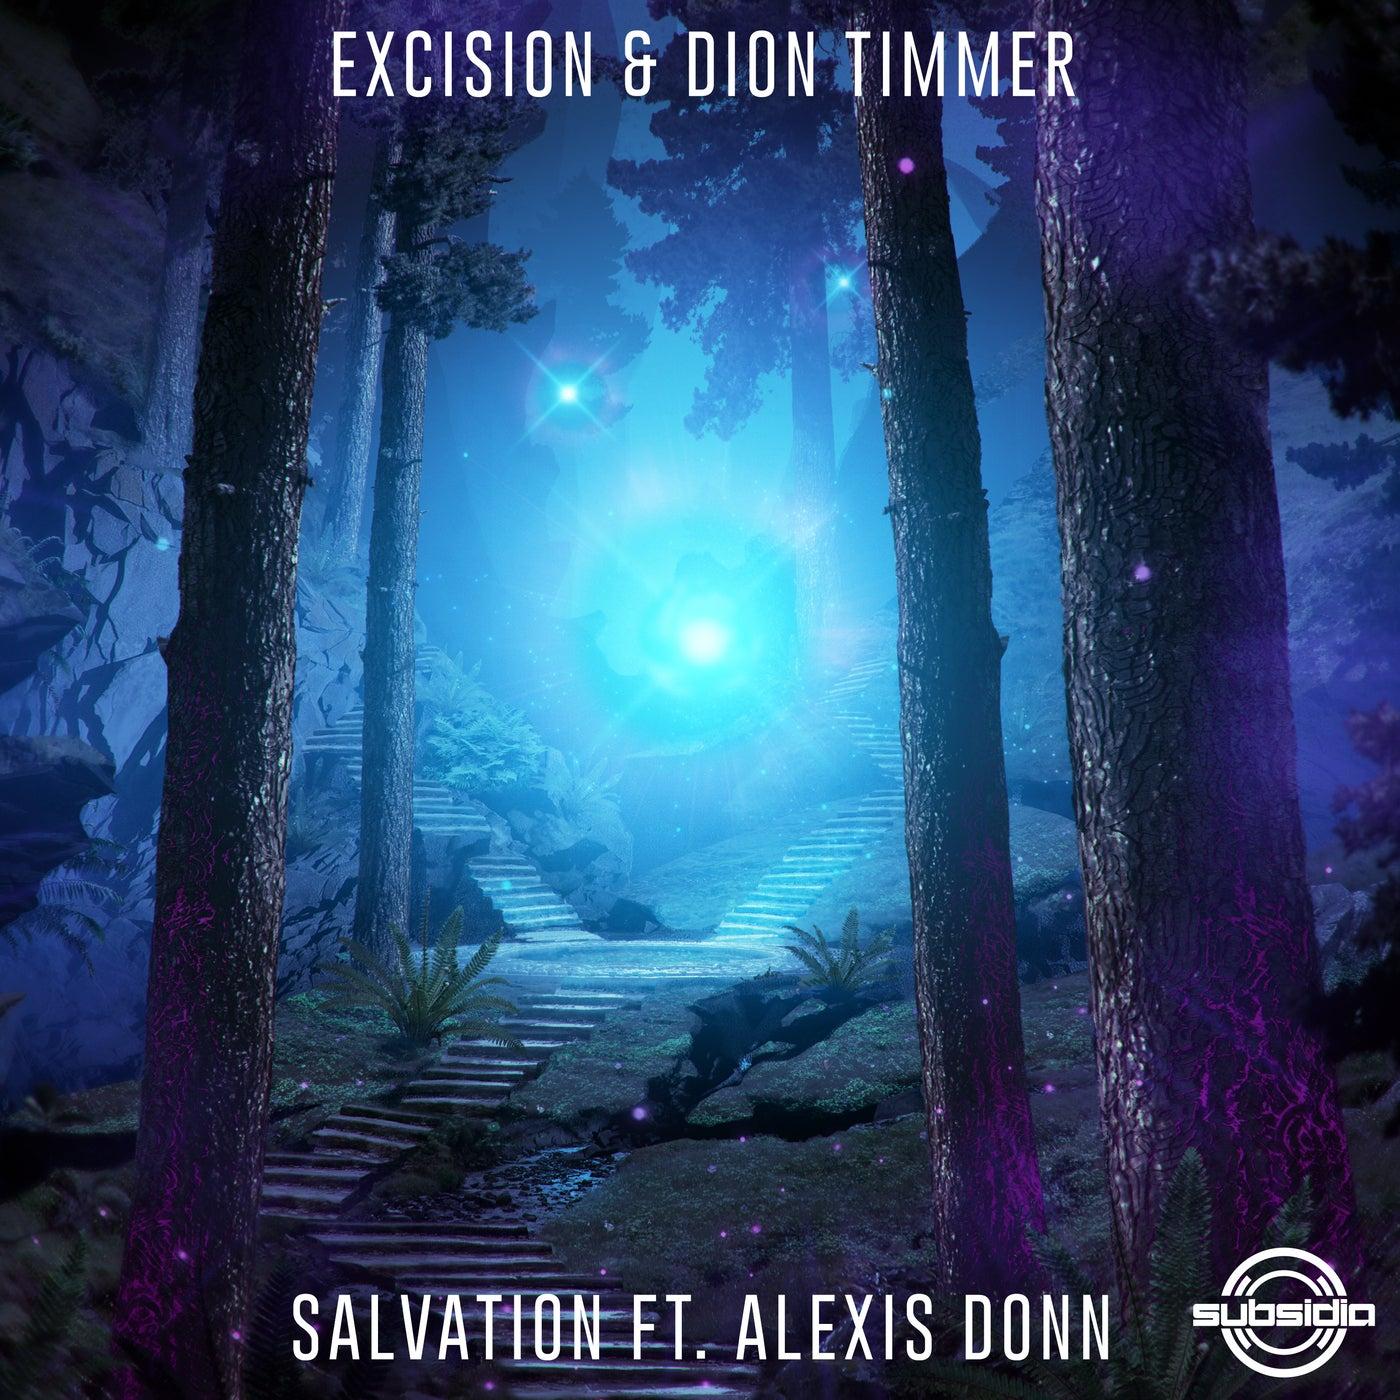 Salvation feat. Alexis Donn (Original Mix)